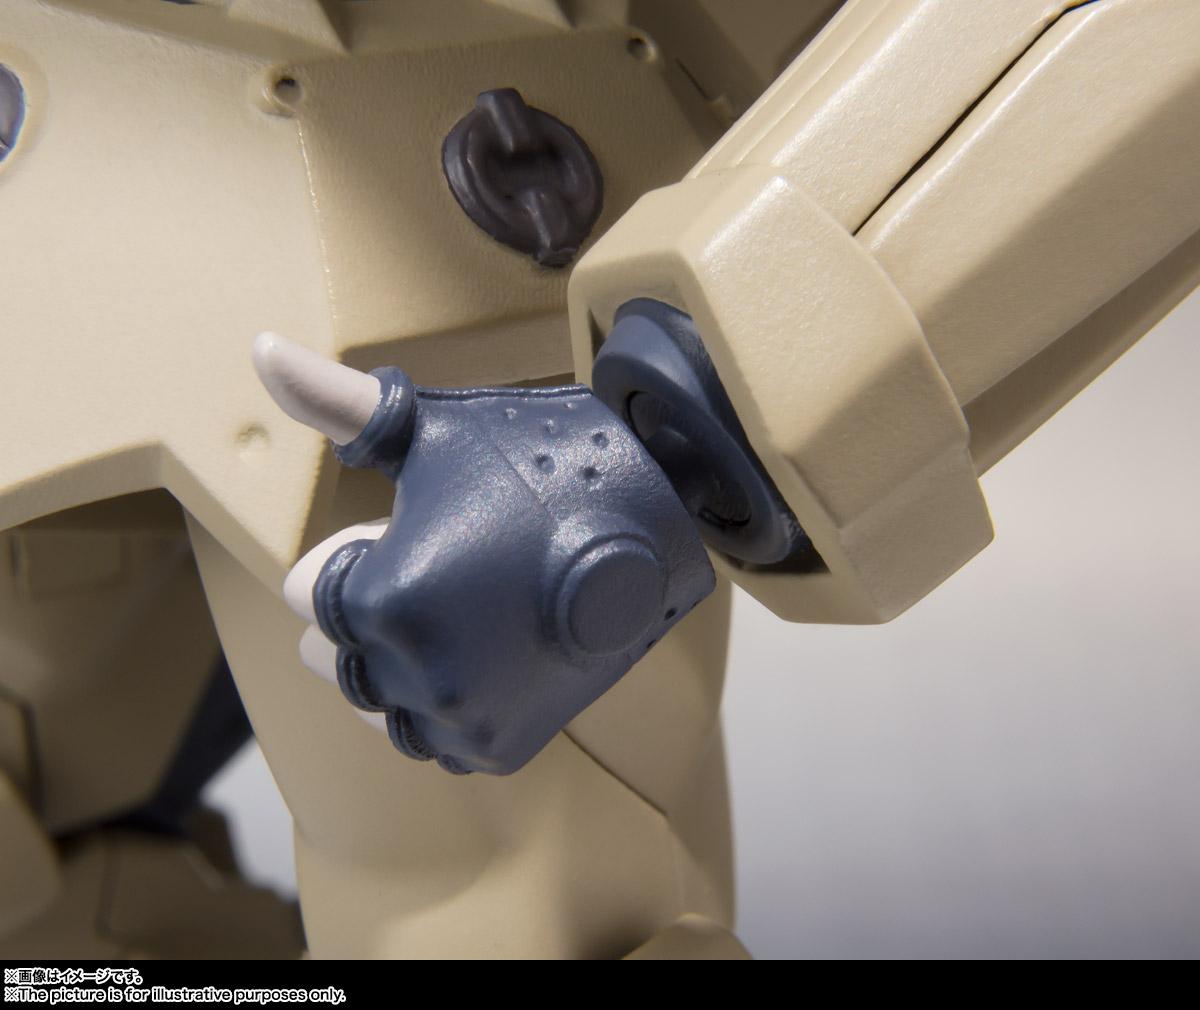 ROBOT魂〈SIDE TA〉『壱七式戦術甲冑雷電』ガサラキ 可動フィギュア-014